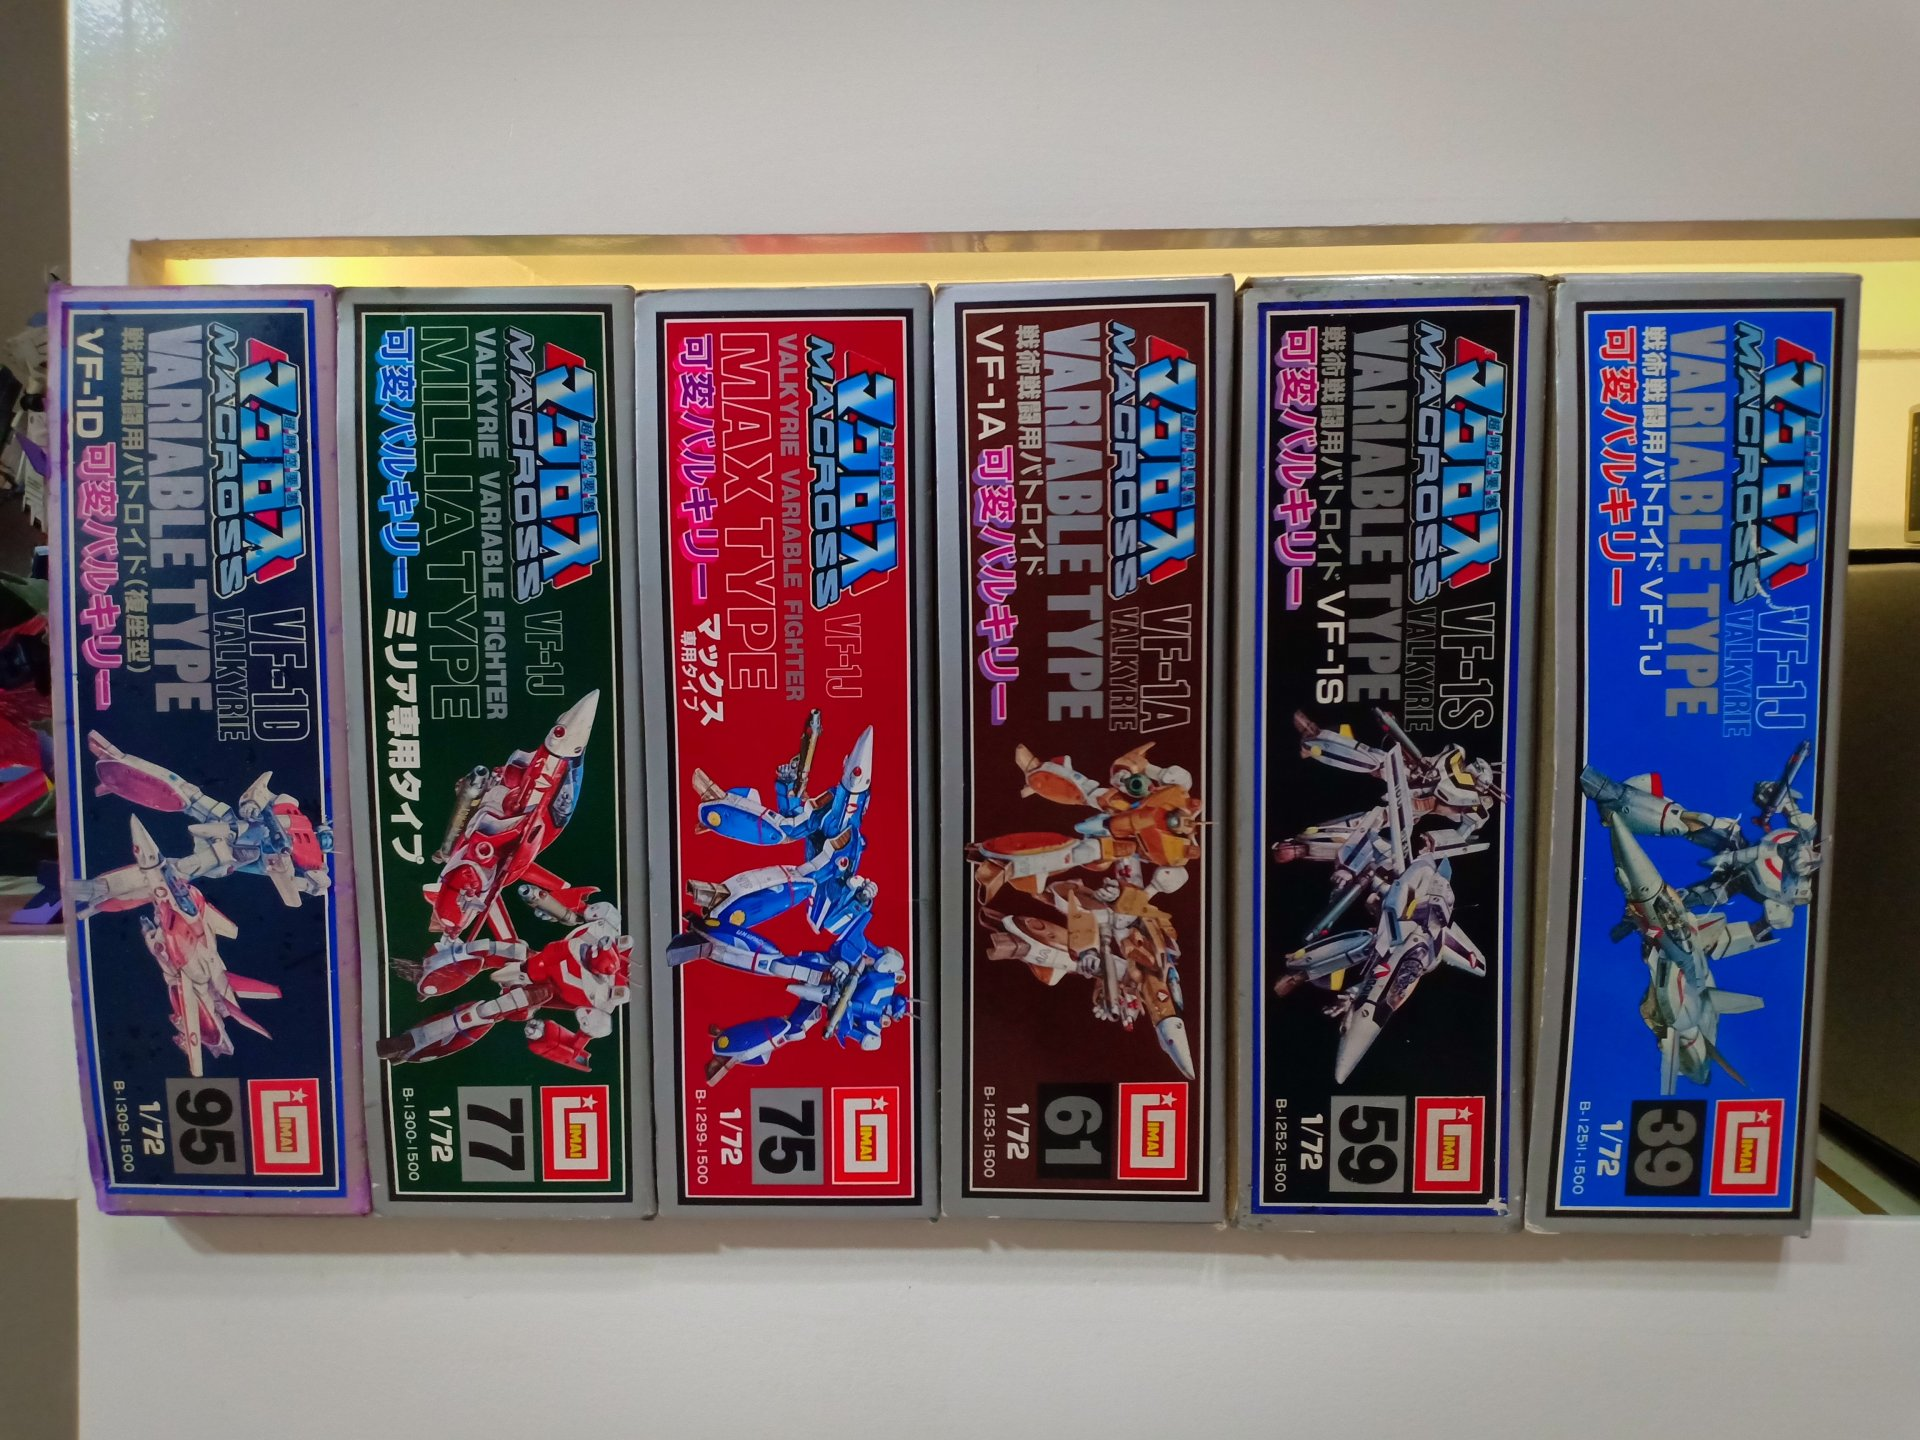 Imai 1-72 Model Collection.jpg